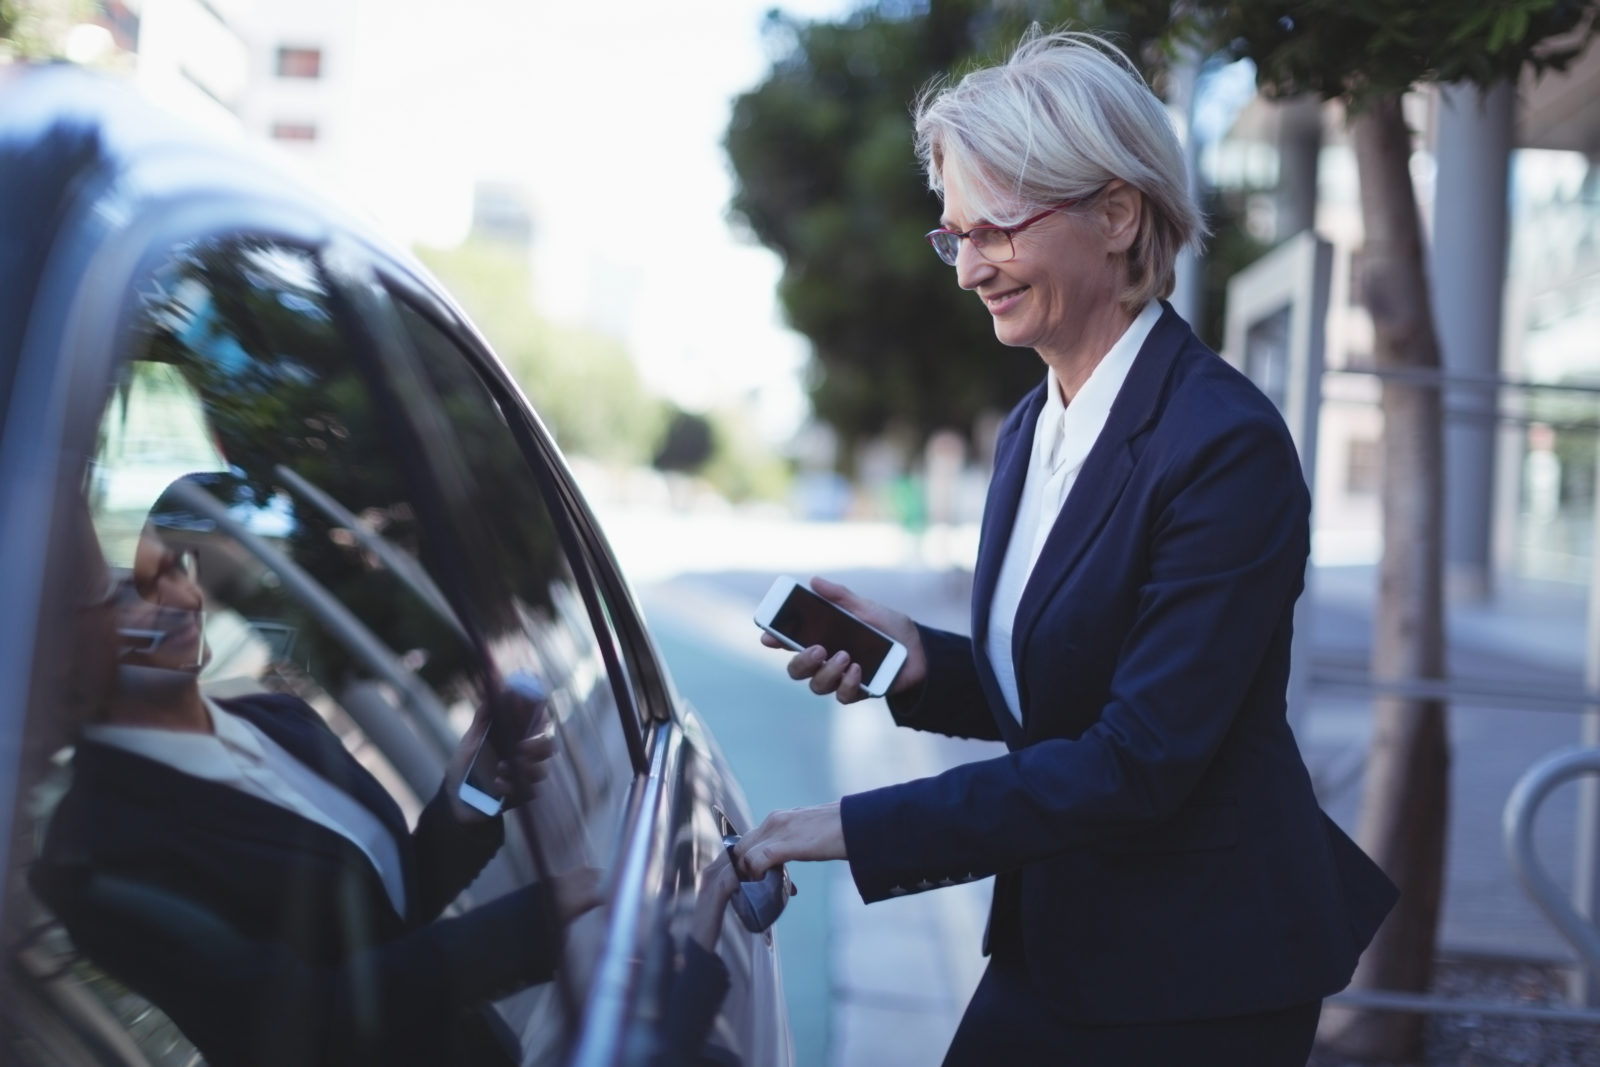 Barcelona regula VTC uber cabify